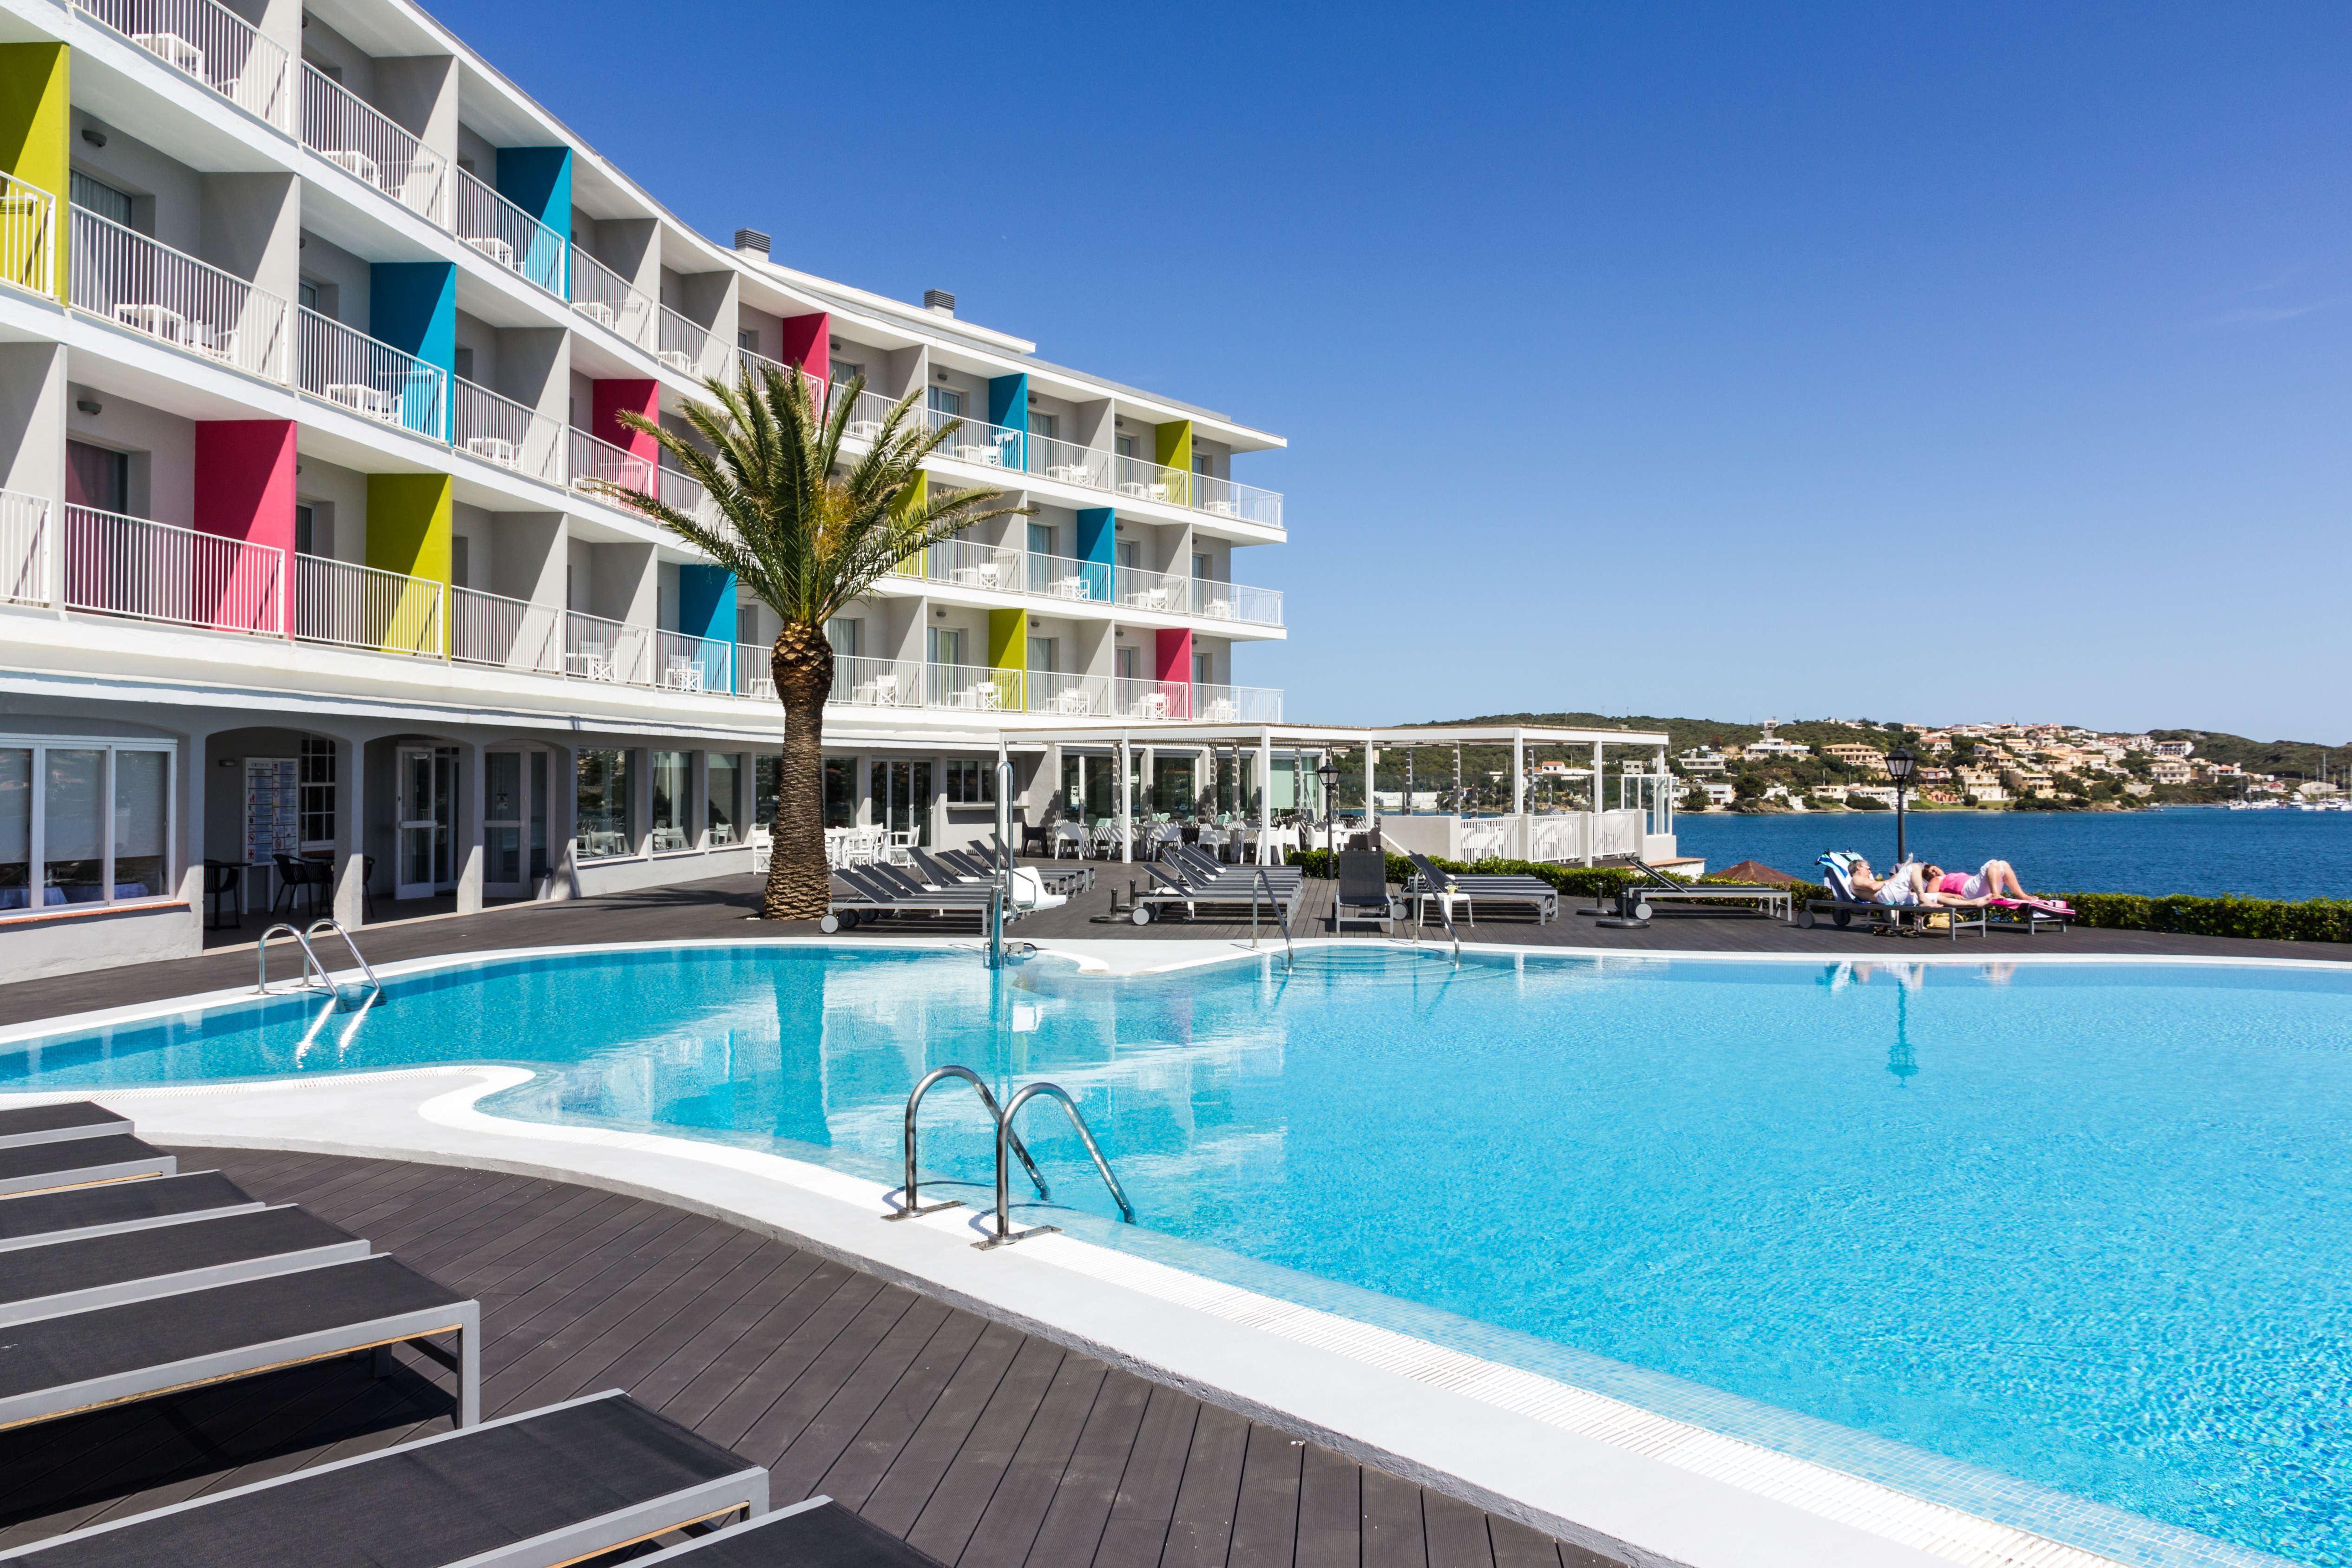 Pool, Hotell Artiem Carlos III, Es Castell, Menorca, Signaturresor